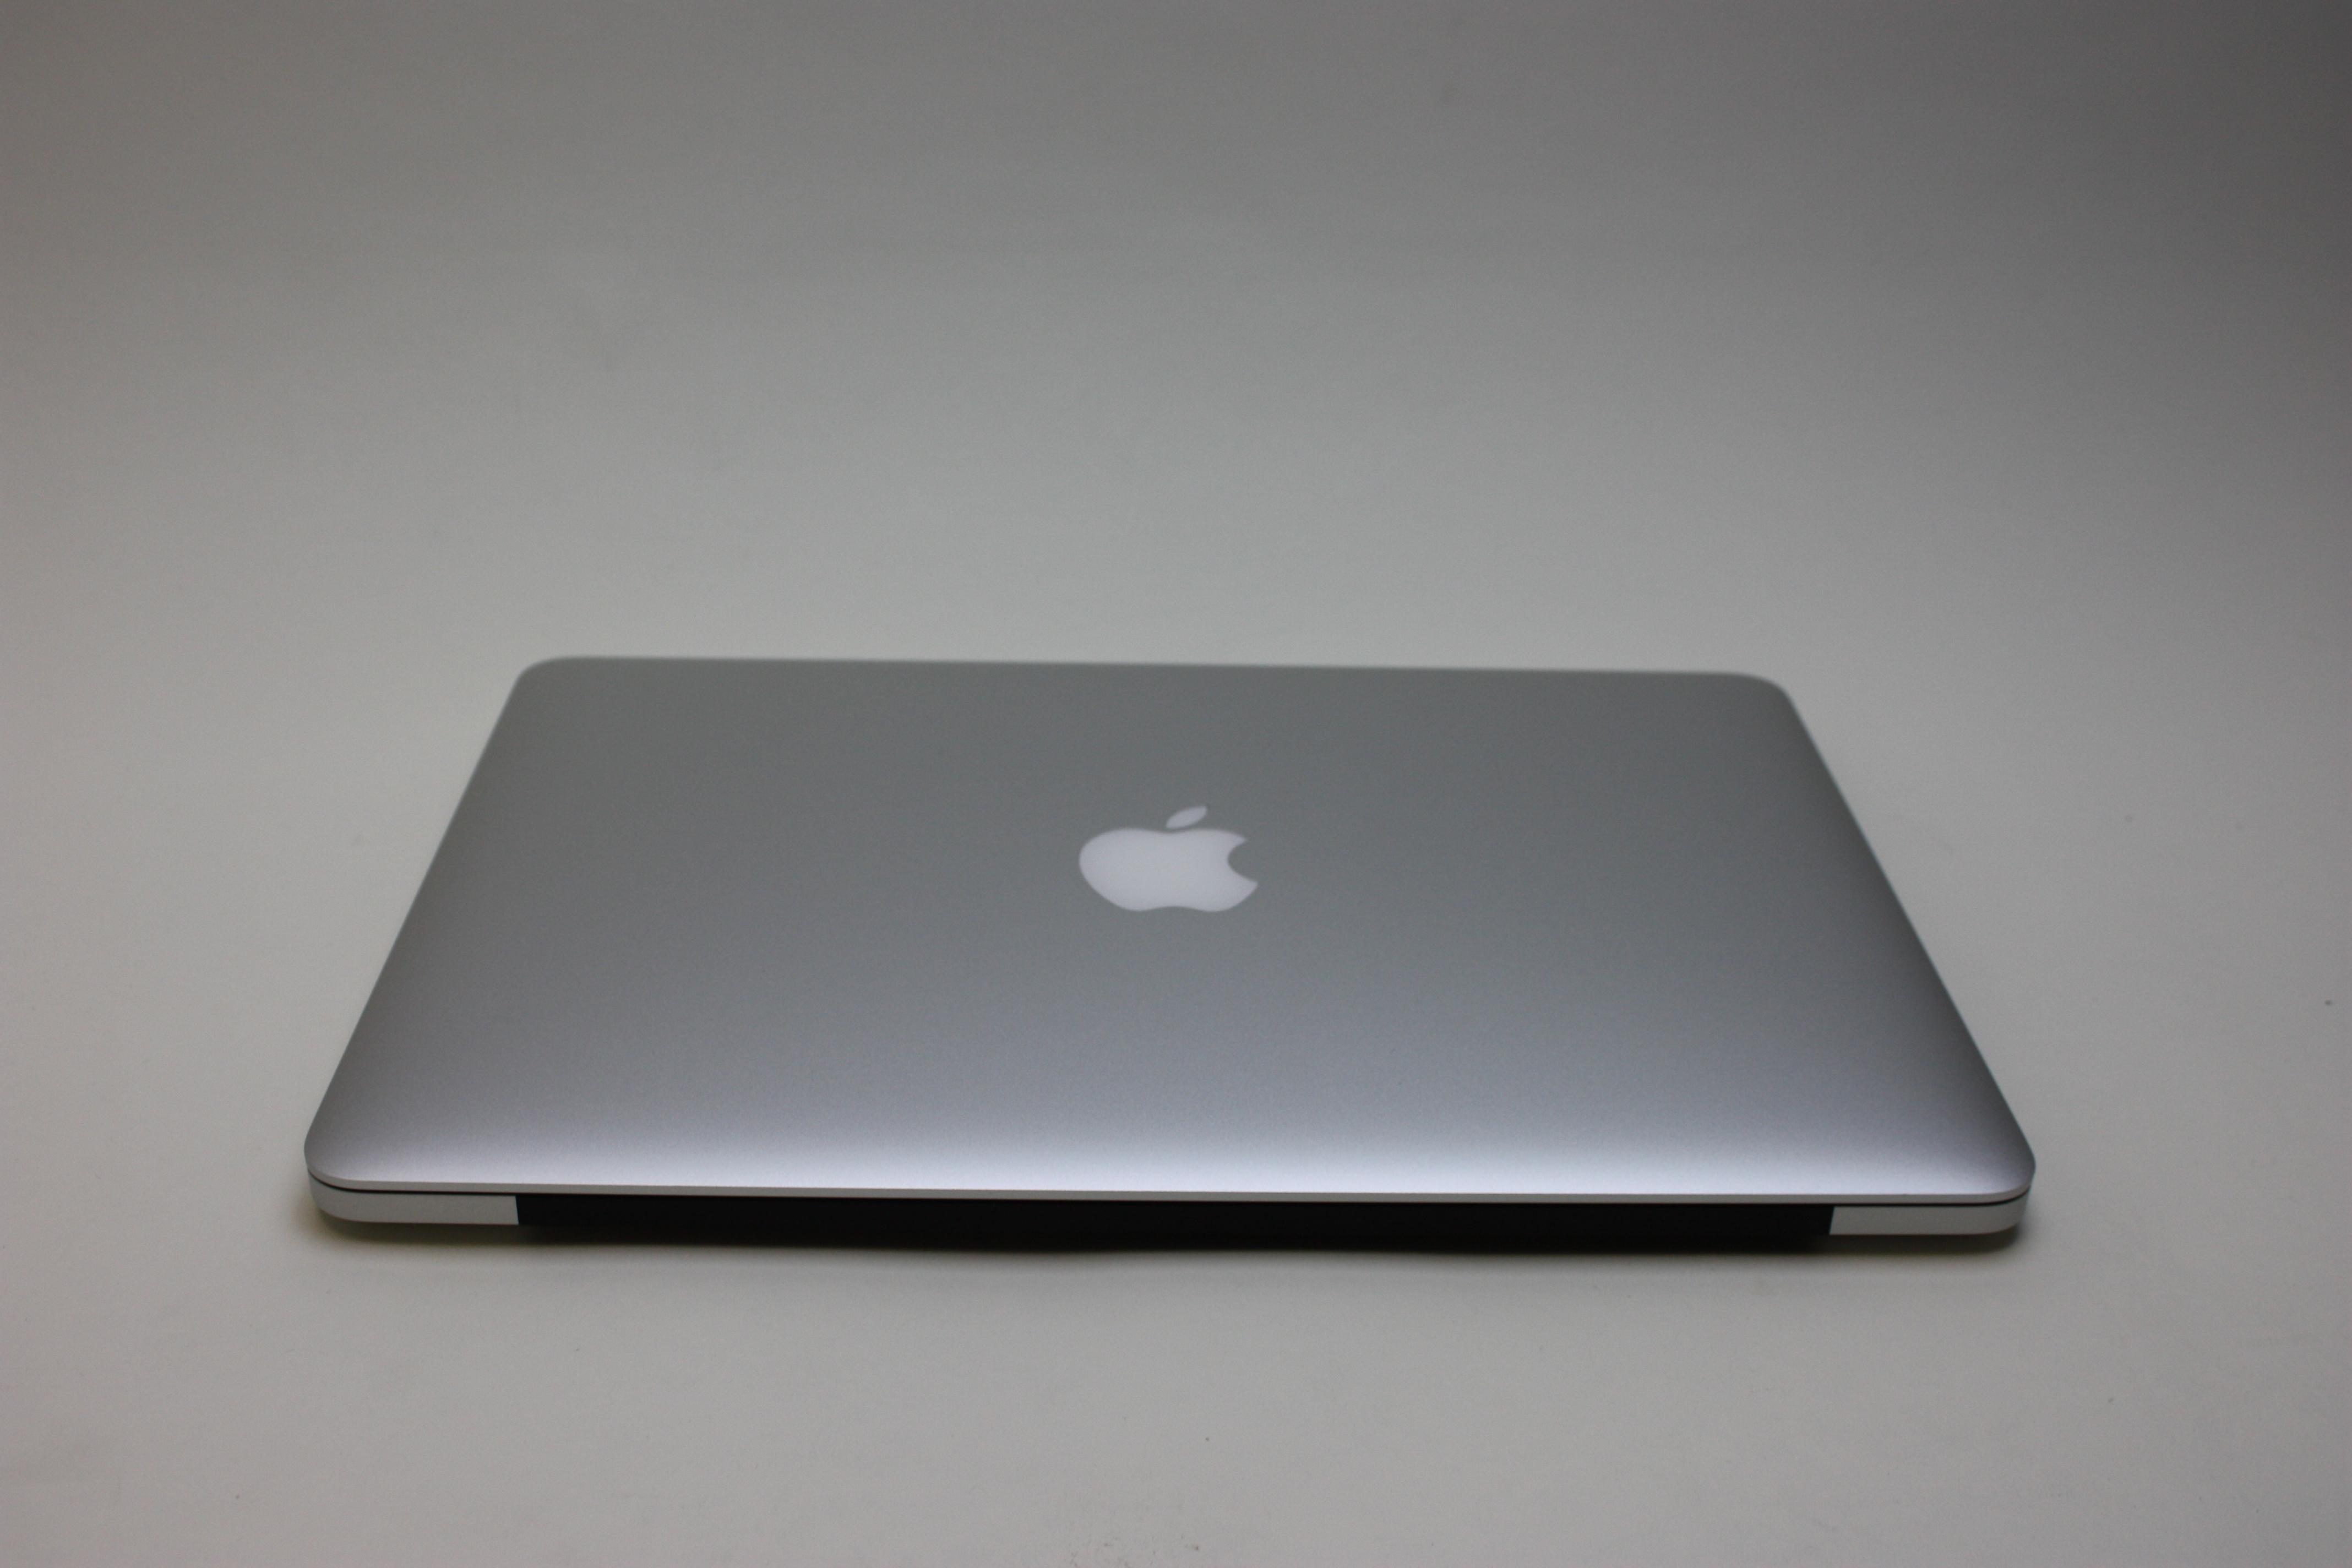 MacBook Pro 13-inch Retina, 2.7 GHz Core i5 (I5-5257U), 8 GB 1867 MHz DDR3, 128 GB Flash Storage, image 6